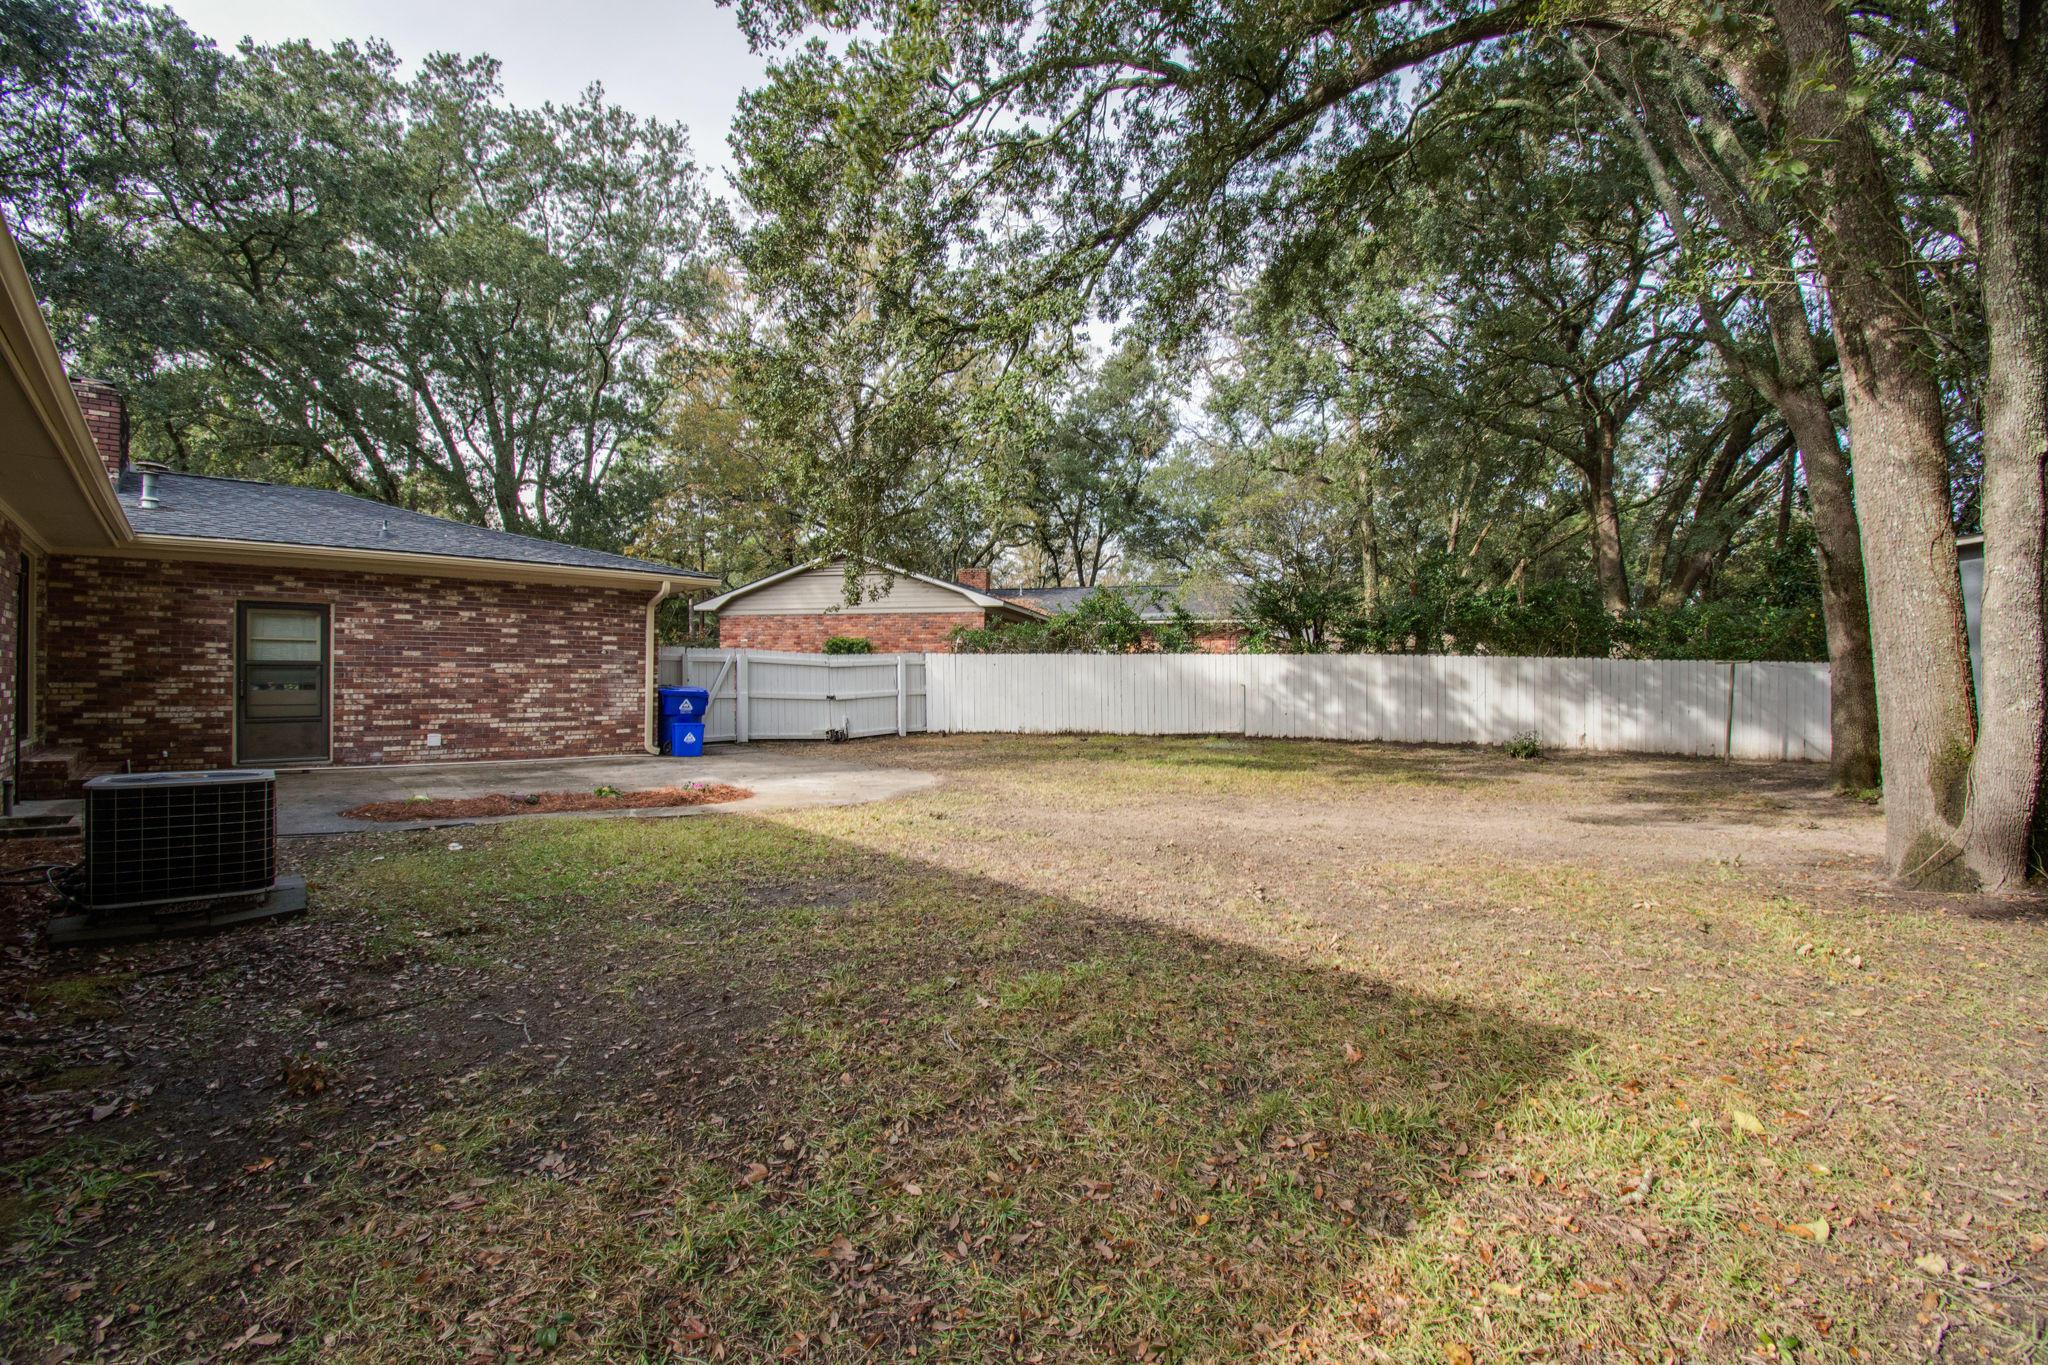 Northbridge Terrace Homes For Sale - 1114 Northbridge, Charleston, SC - 17